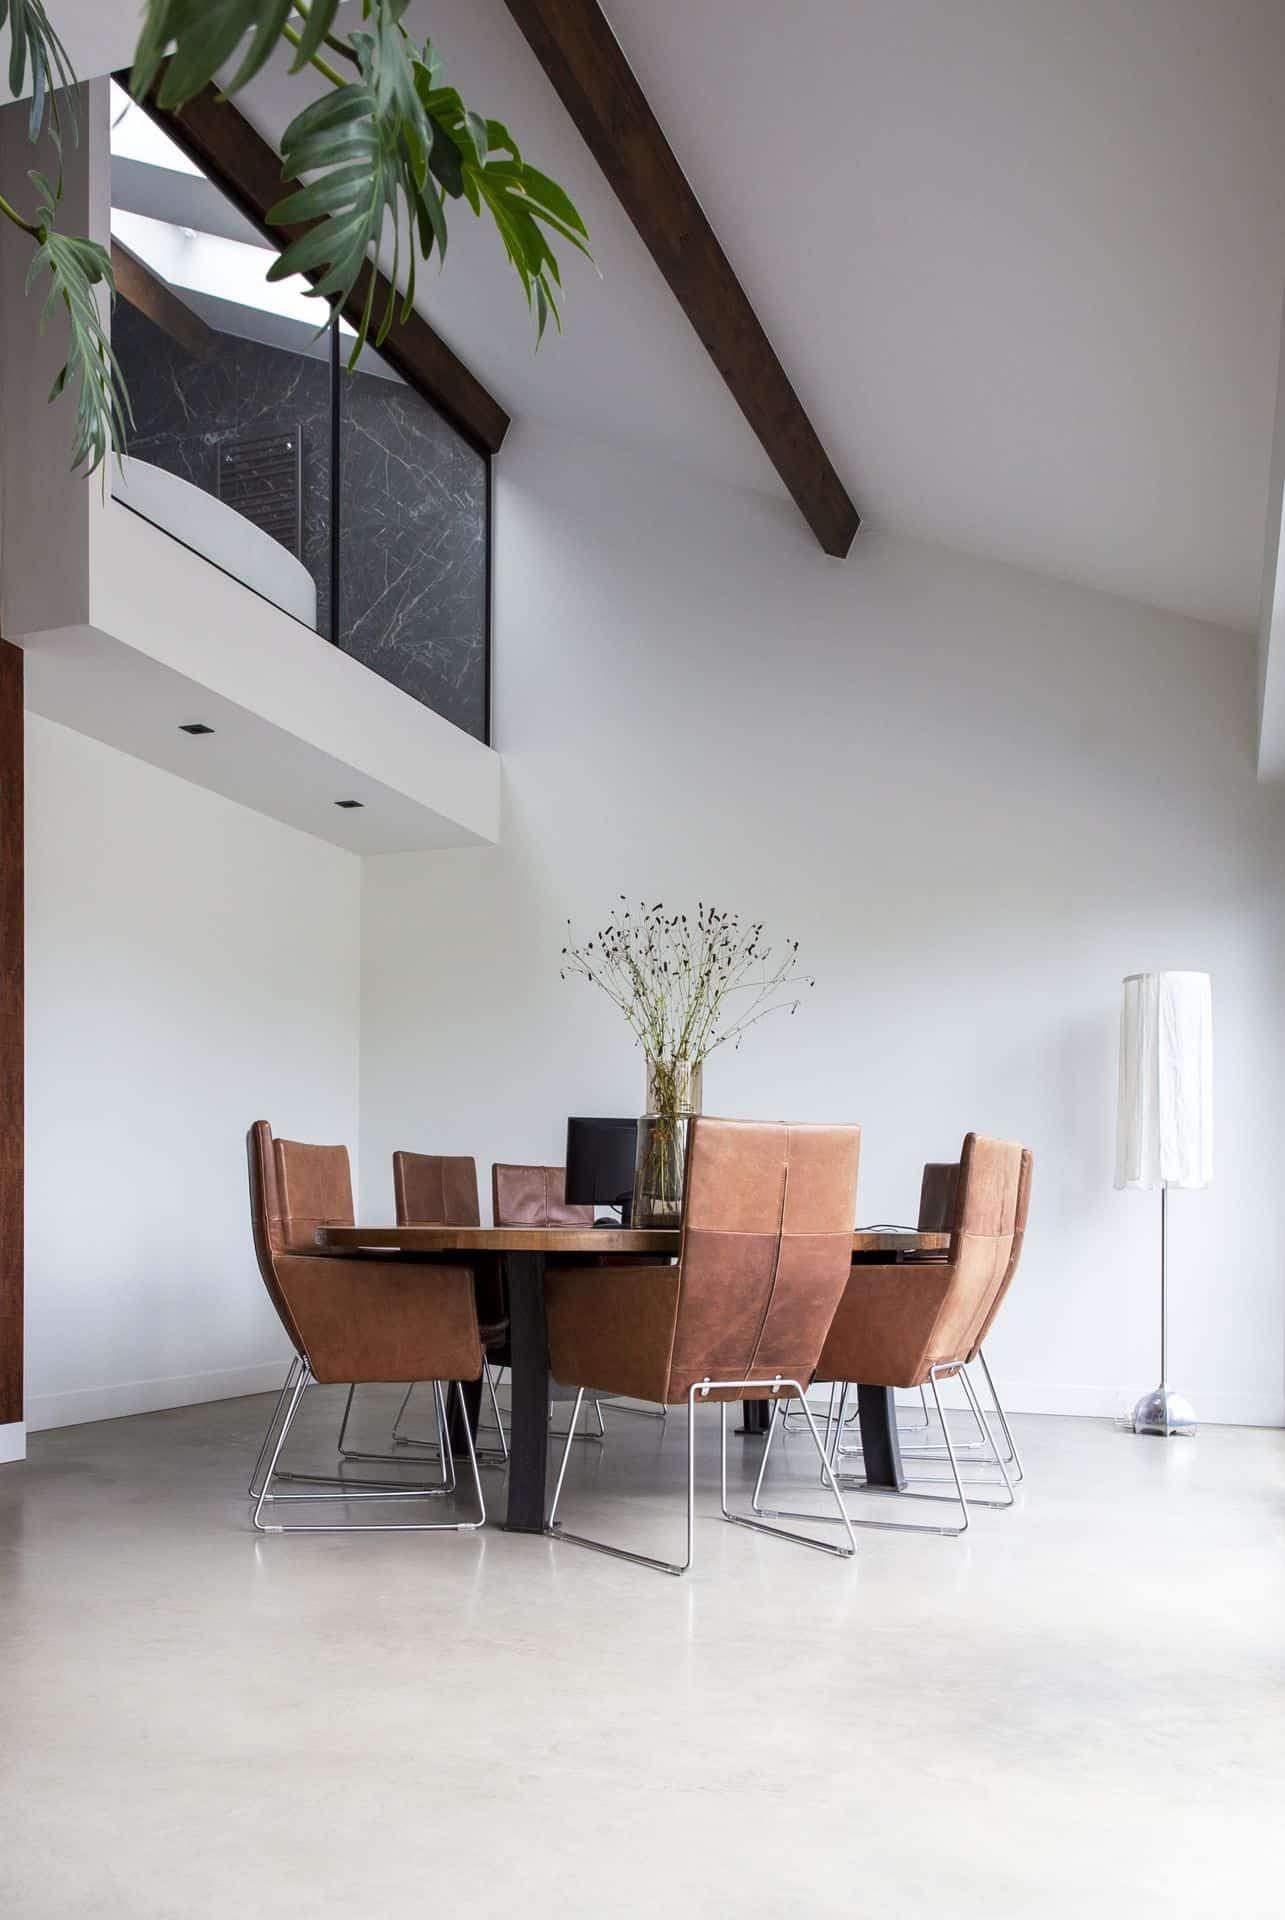 betonnen vloeren, gevlinderd beton design, design betonvloer